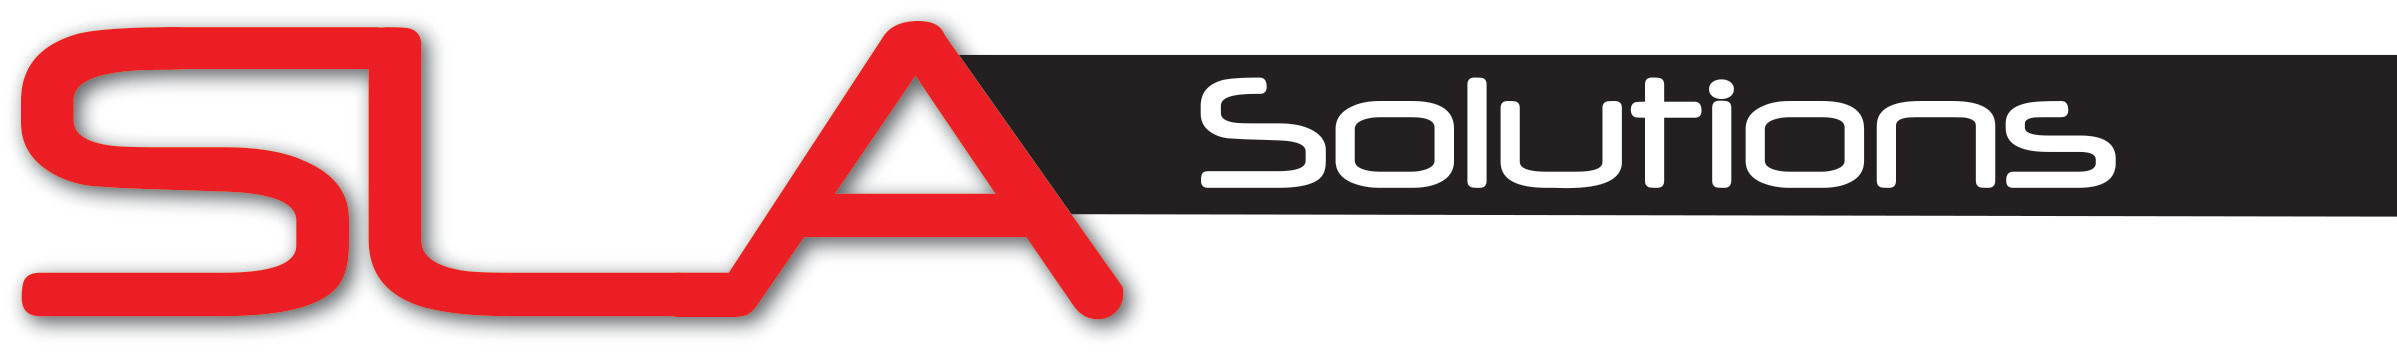 SLA Solutions - Liquor License Professionals in Buffalo, NY